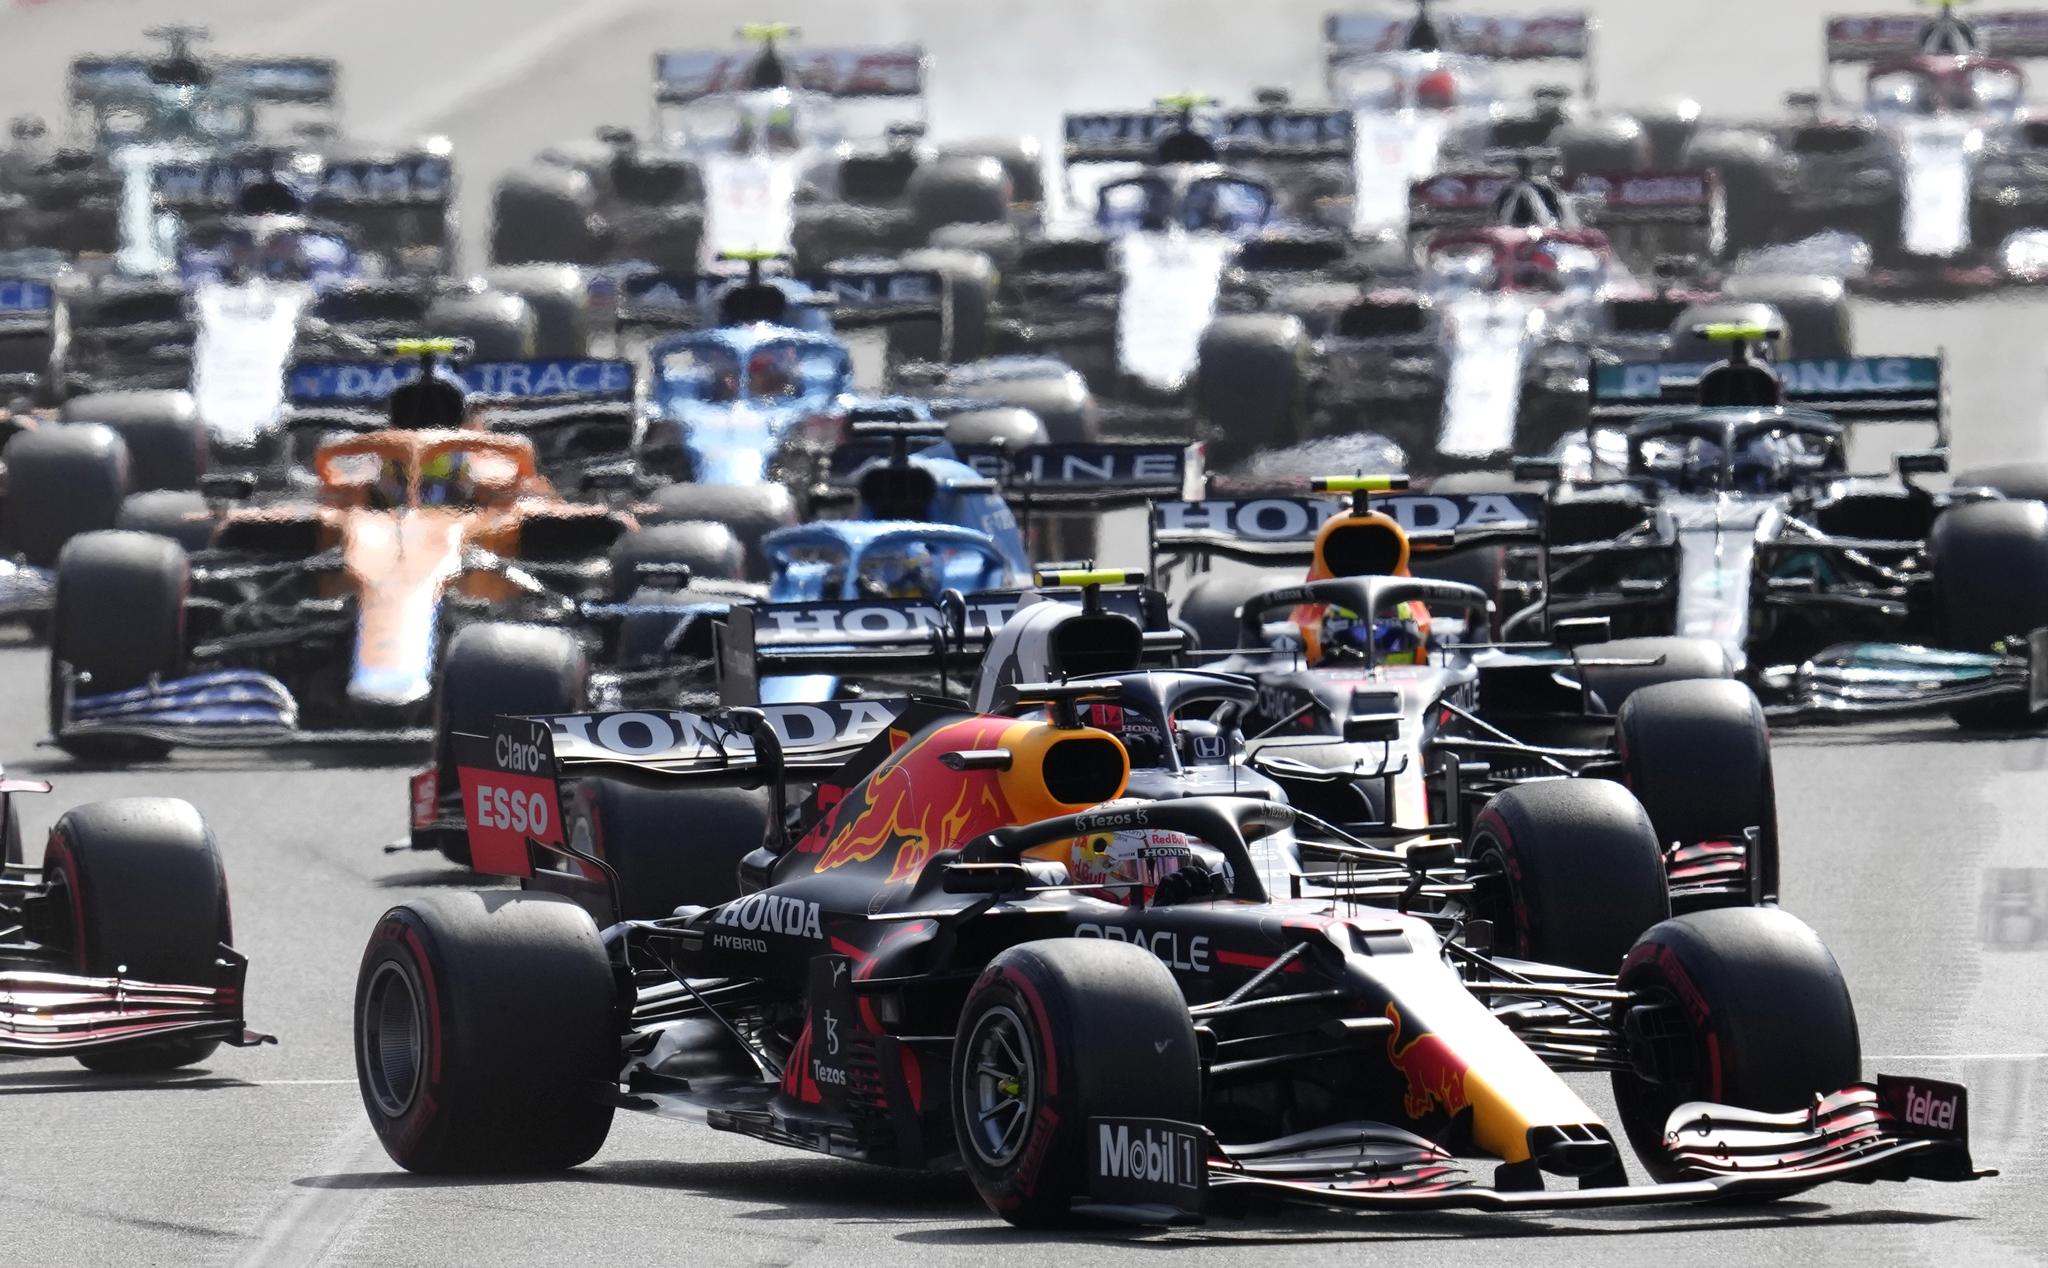 Red Bull driver Max Verstappen of the Netherlands, center, steers his car during the Formula One Grand Prix at the lt;HIT gt;Baku lt;/HIT gt; Formula One city circuit in lt;HIT gt;Baku lt;/HIT gt;, Azerbaijan, Sunday, June 6, 2021. (AP Photo/Darko Vojinovic)